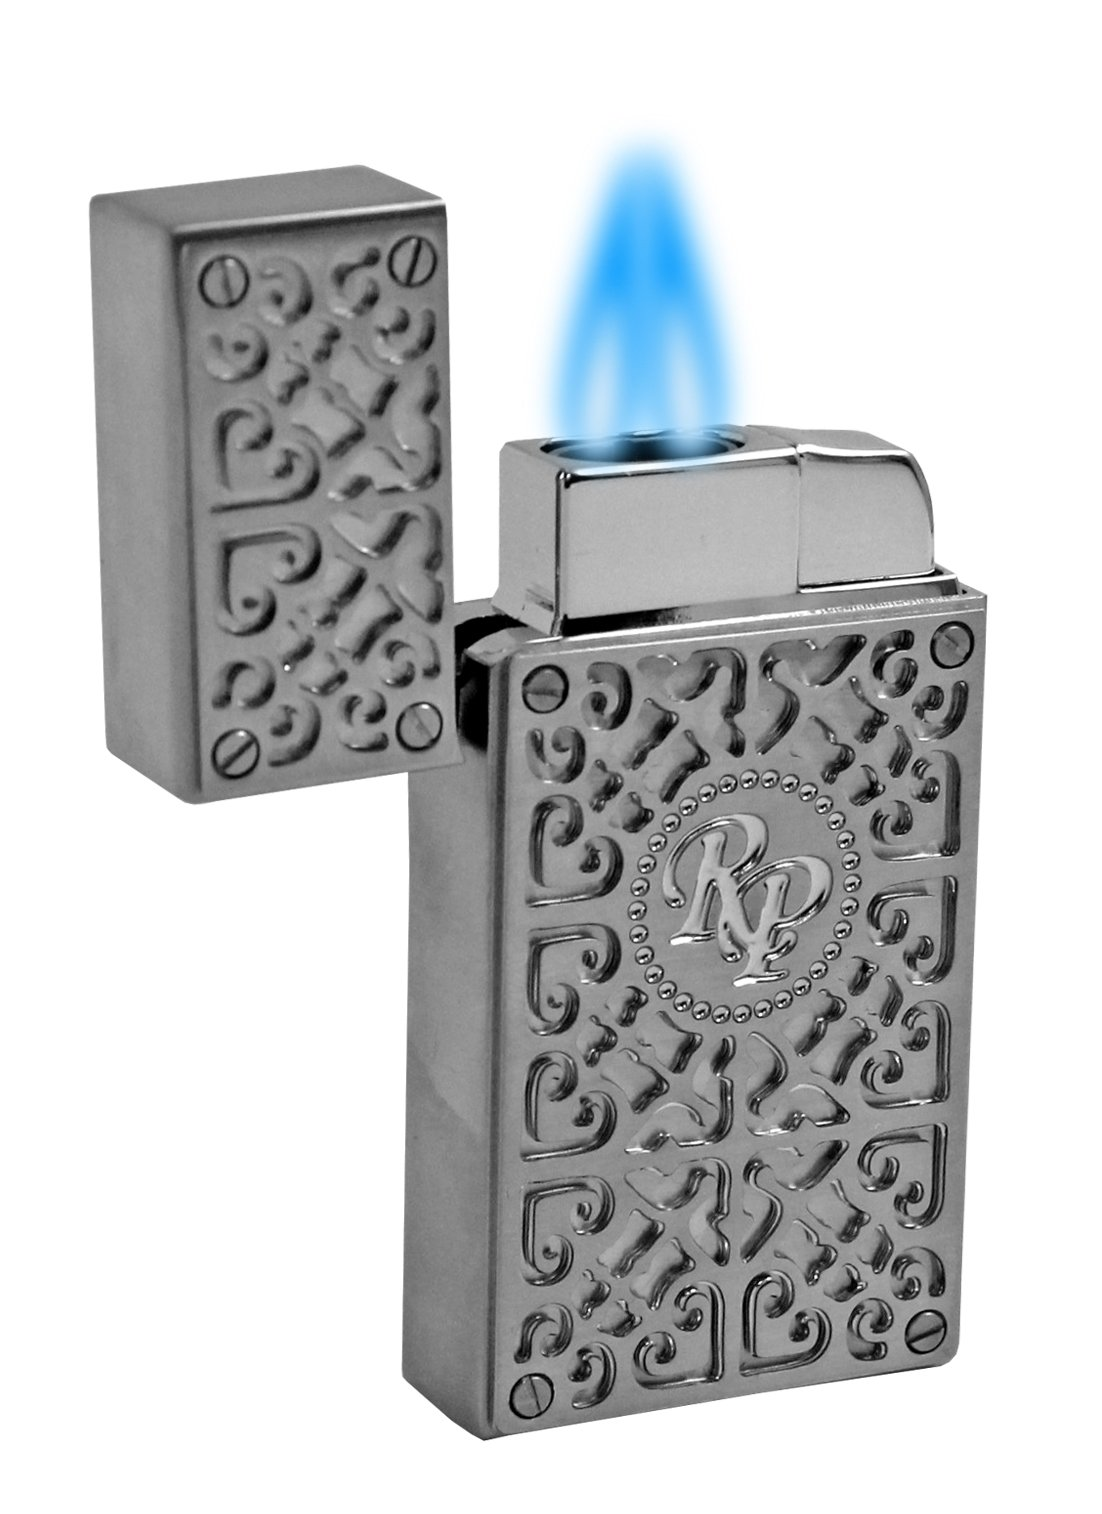 Rocky Patel Burn Collection Torch Lighter - Chrome with Chrome by Rocky Patel